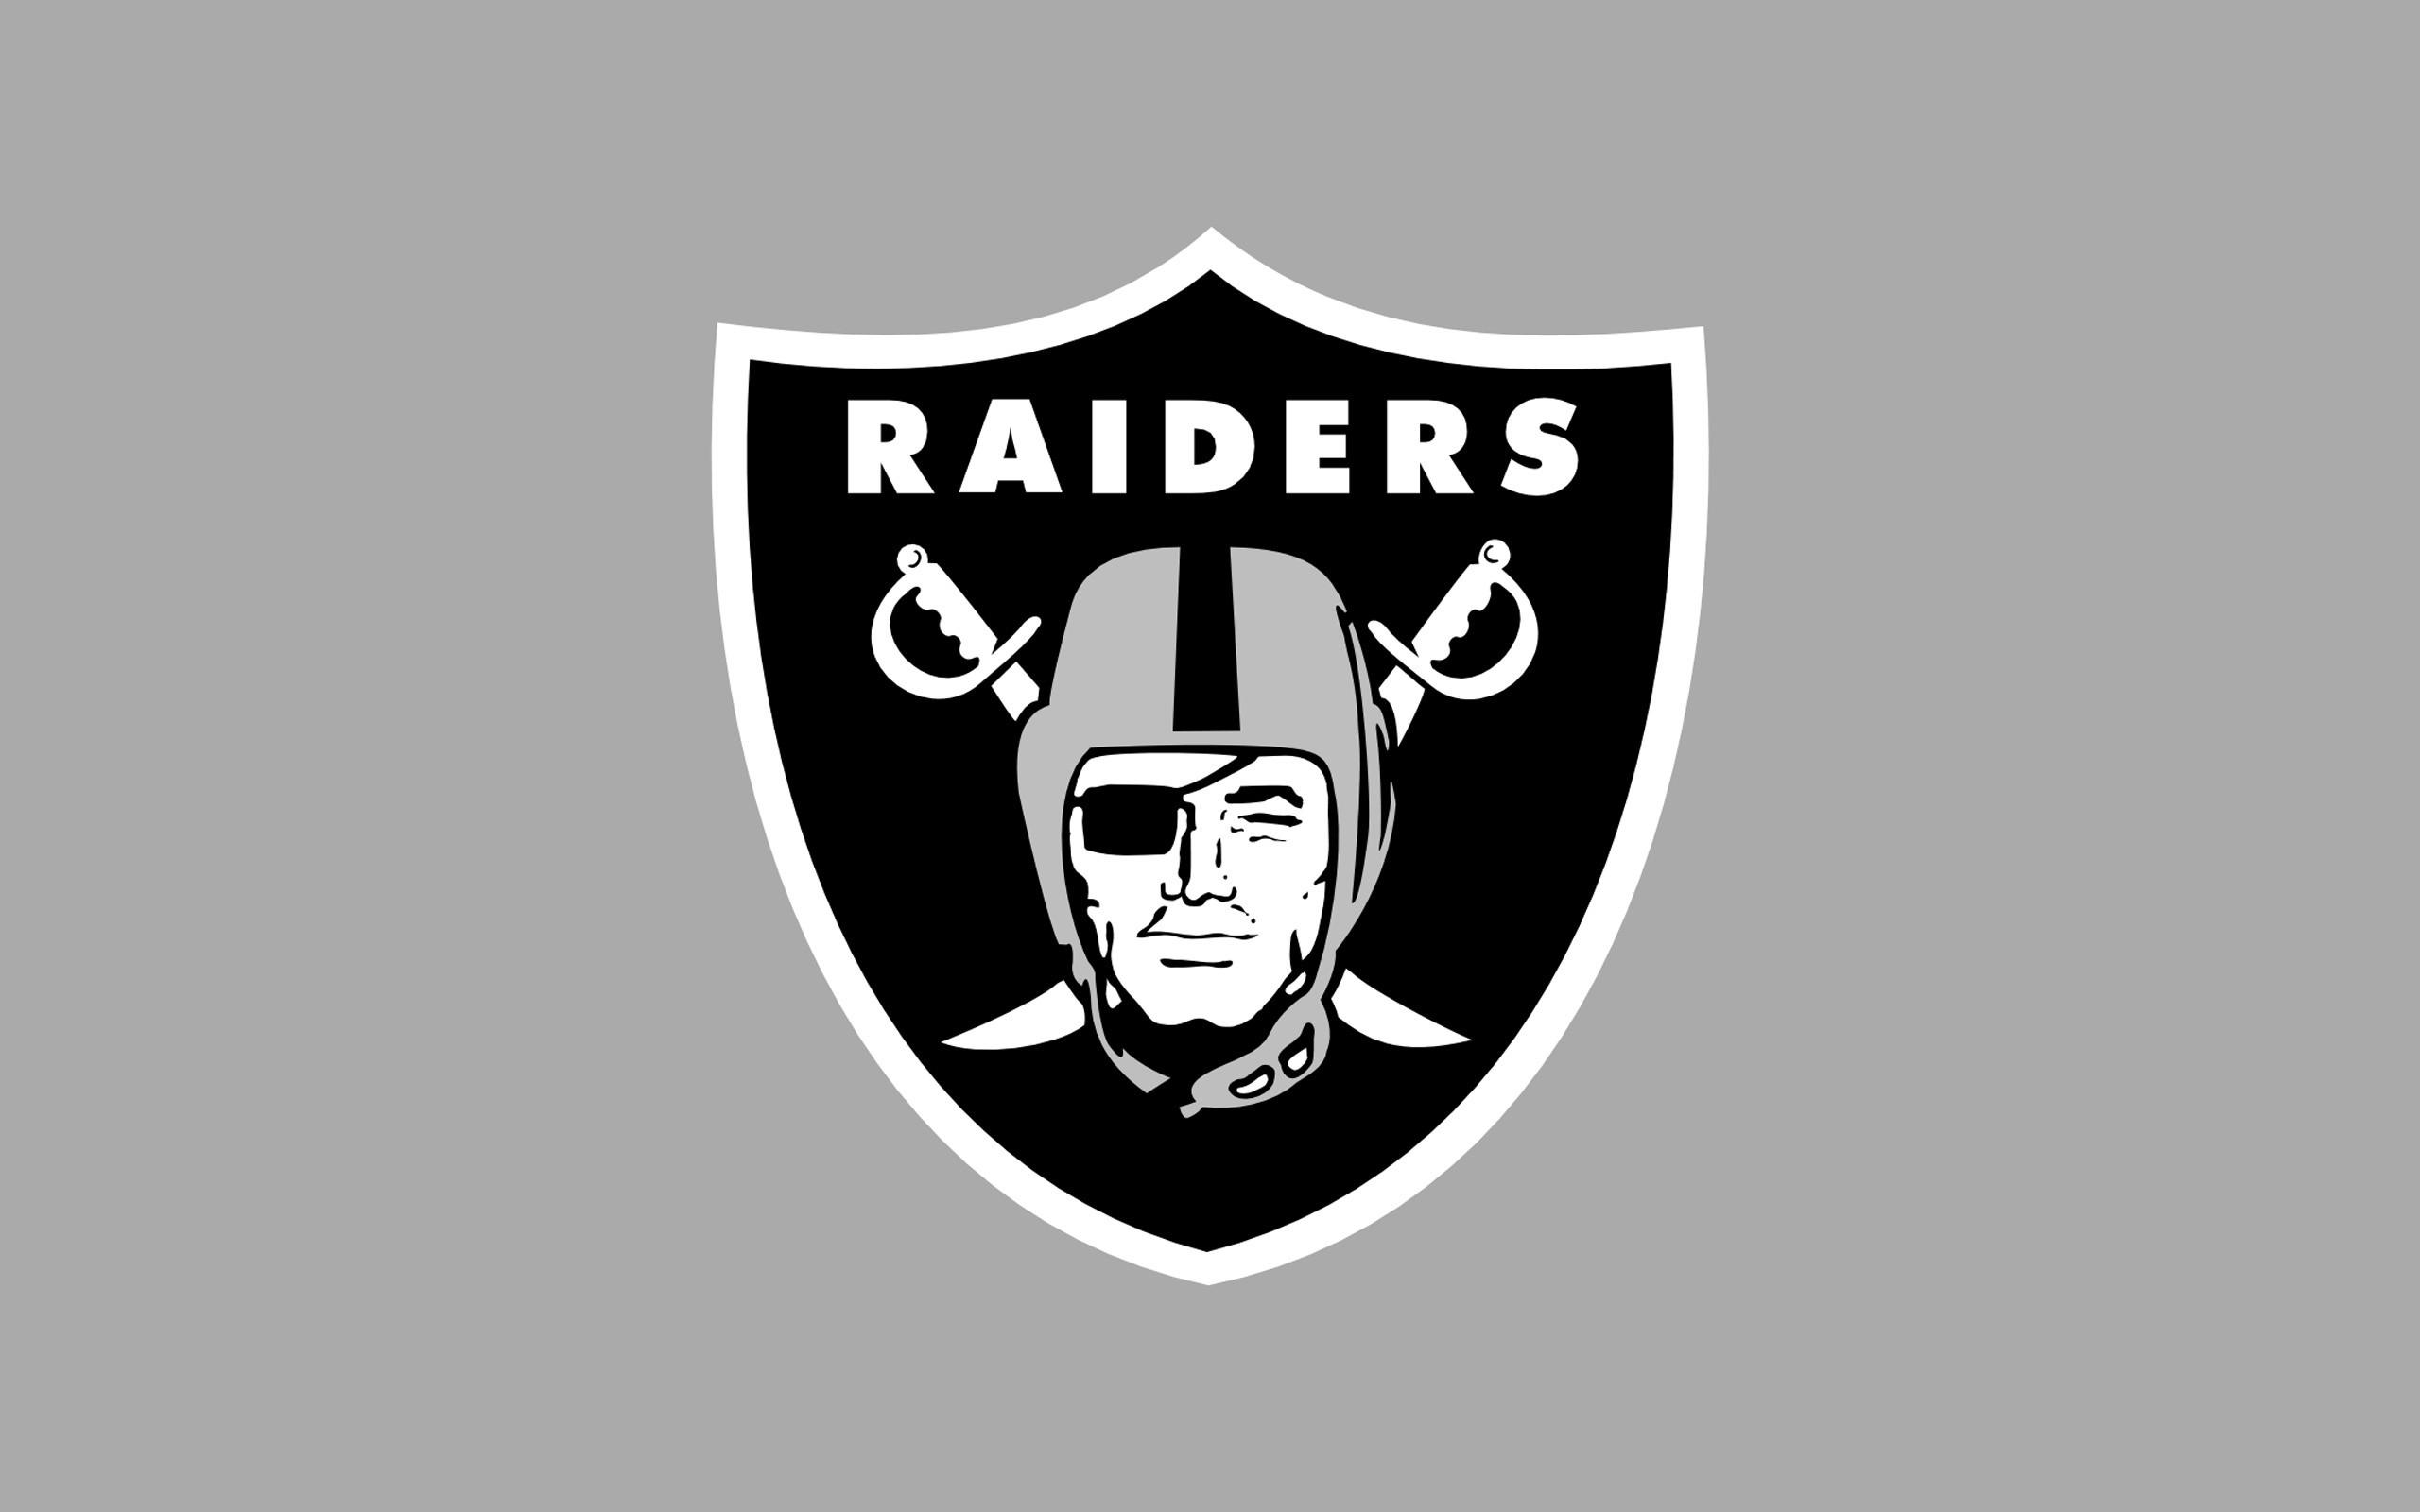 Oakland Raiders Wallpapers – Wallpaper Cave